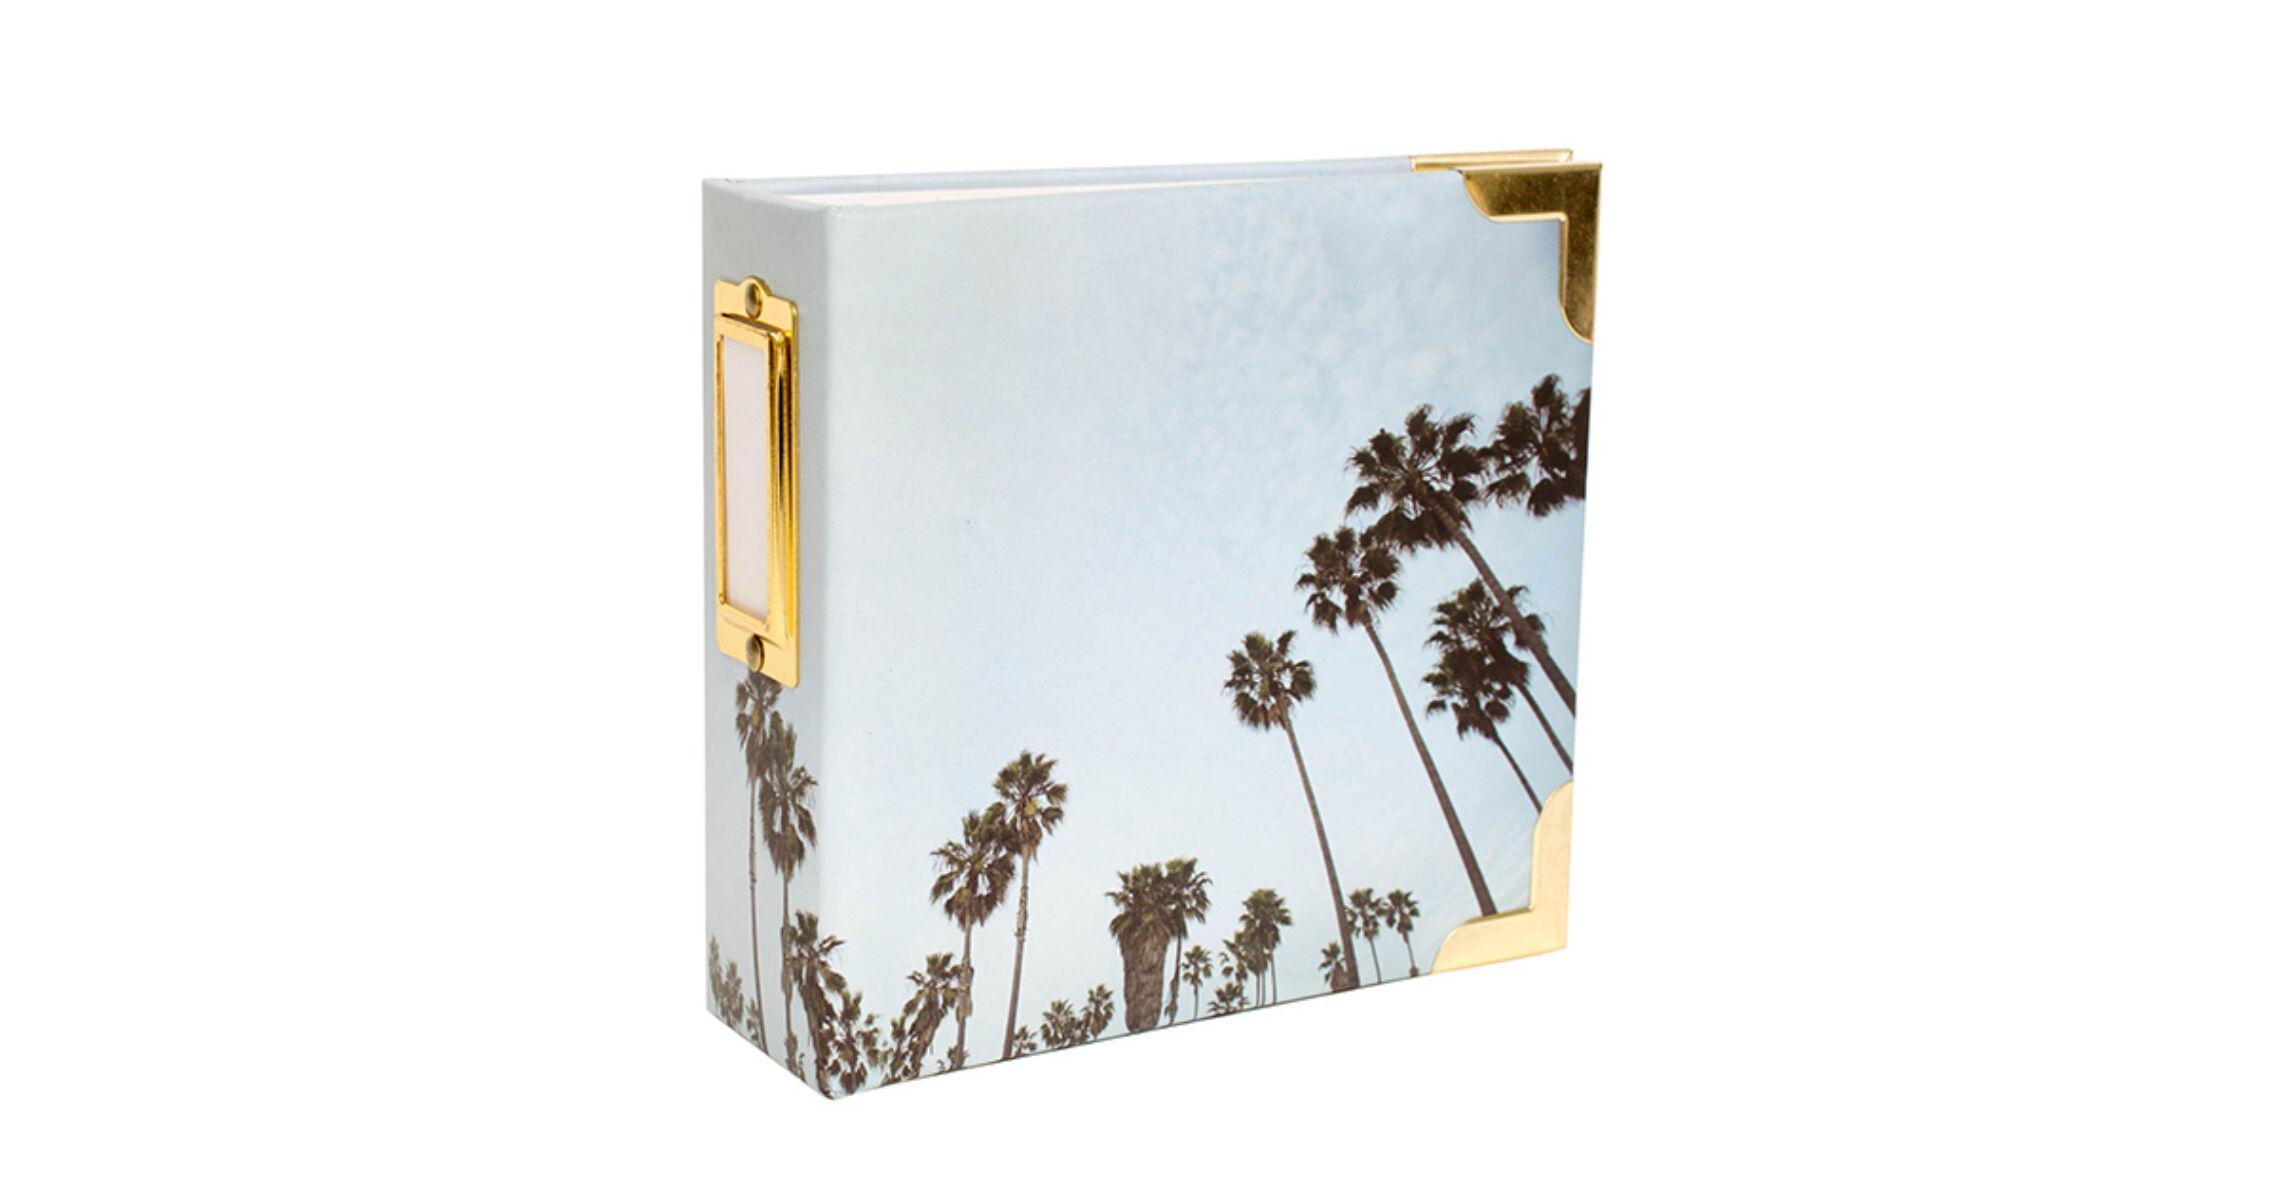 4x4 Insta Album Becky Higgins Project Life 4x4 Album Palm Tree Pink And Paper Scrapbooking Shop